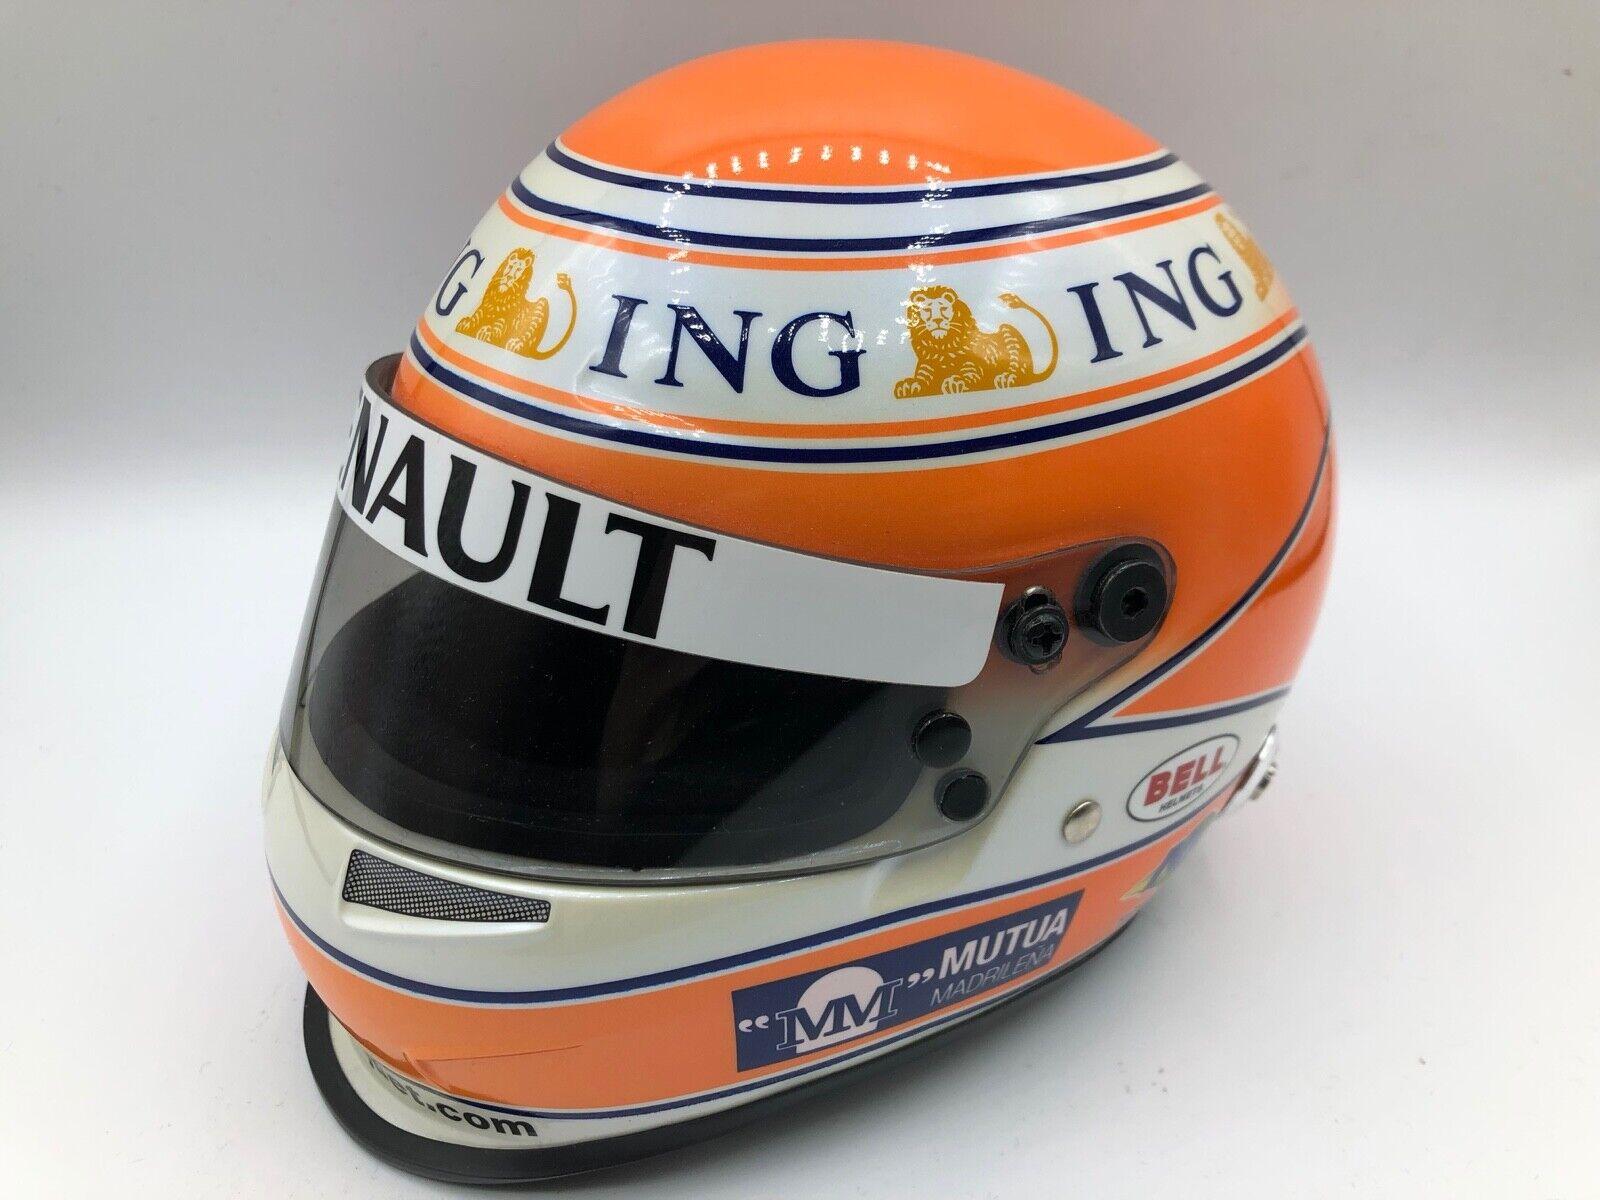 F1 1 2 MINI HELMET Nelson Piquet Renault F1 squadra